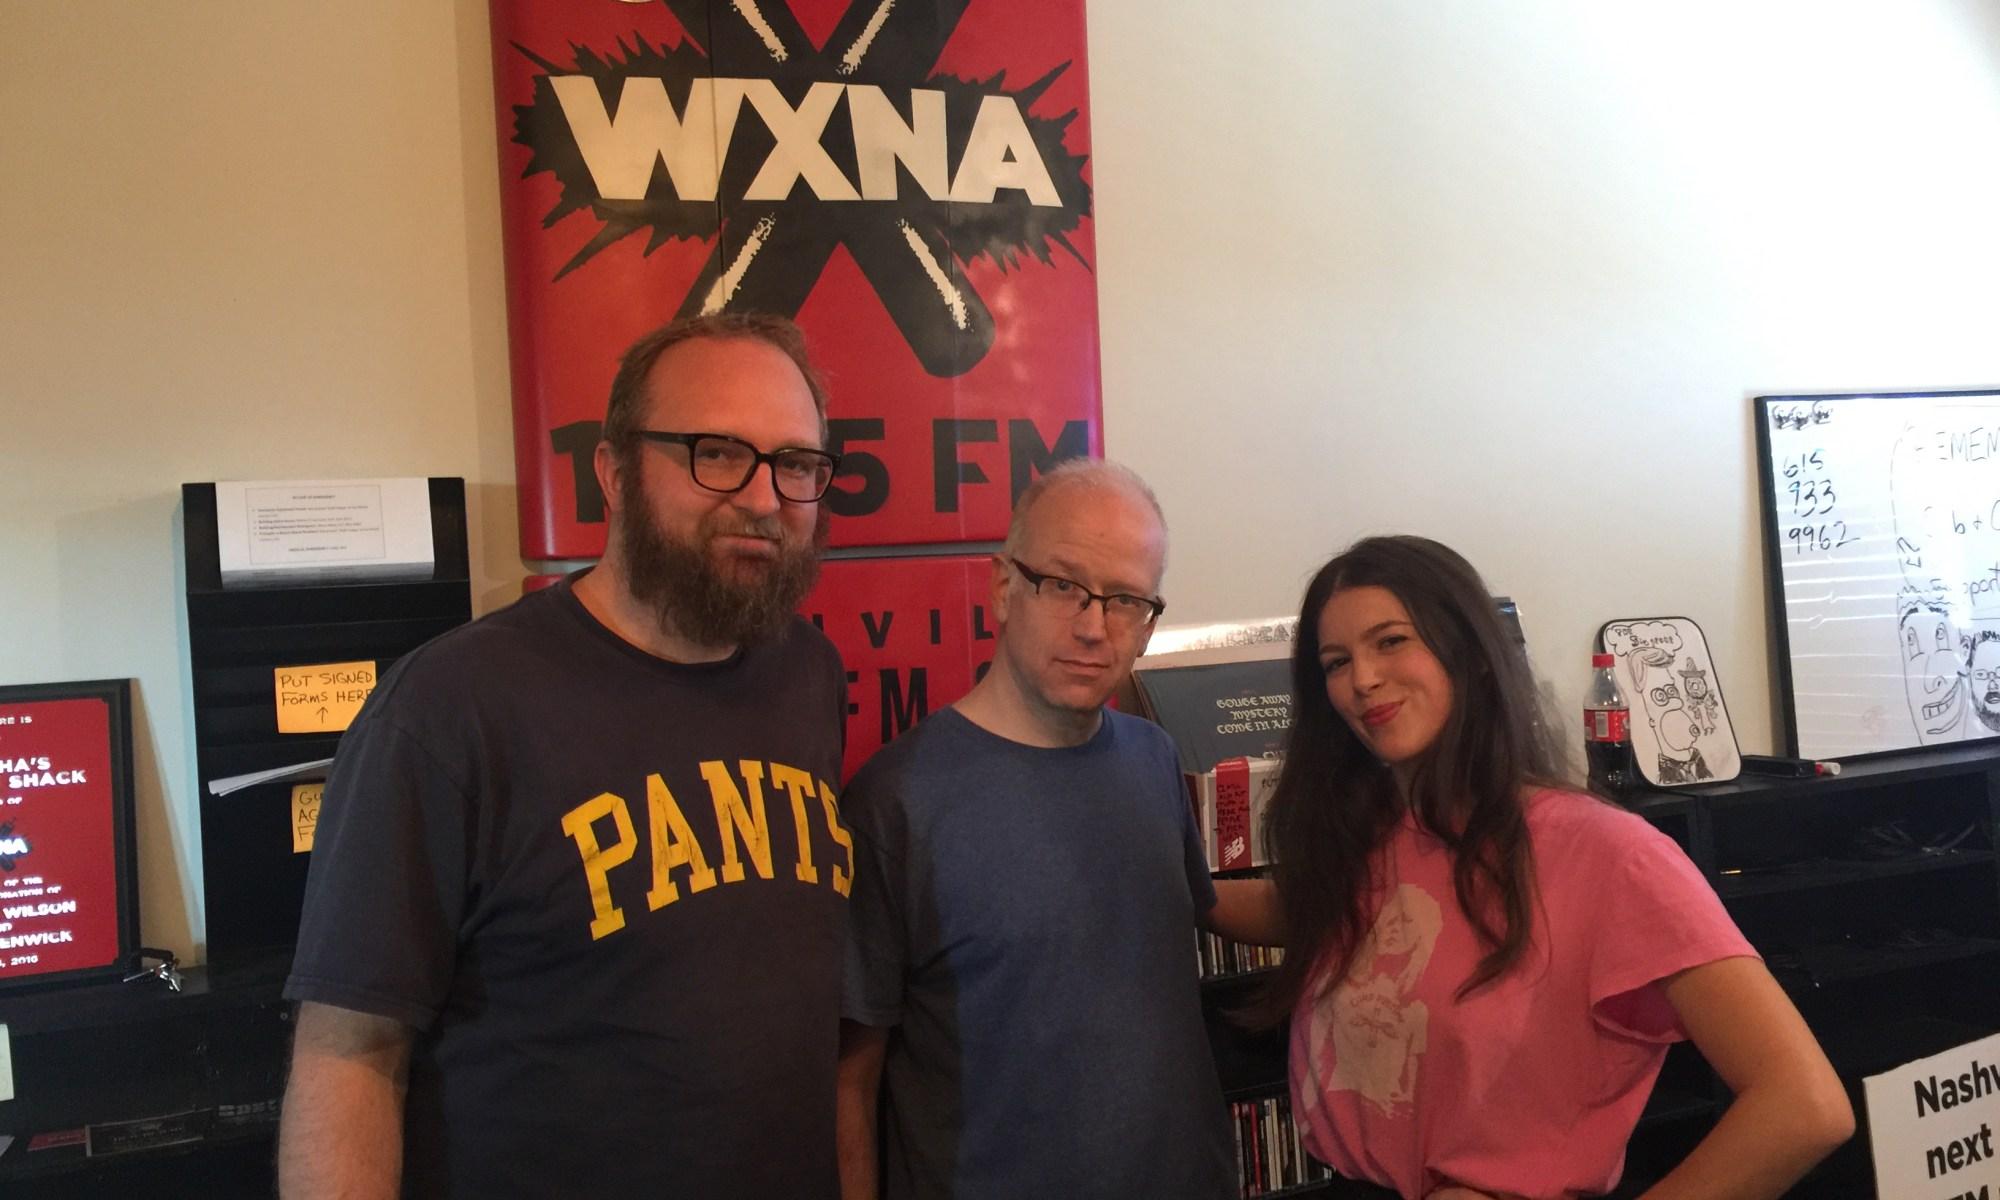 Chad Riden, Michael Buhl, DJ AstroBrooke at WXNA 11/16/12016